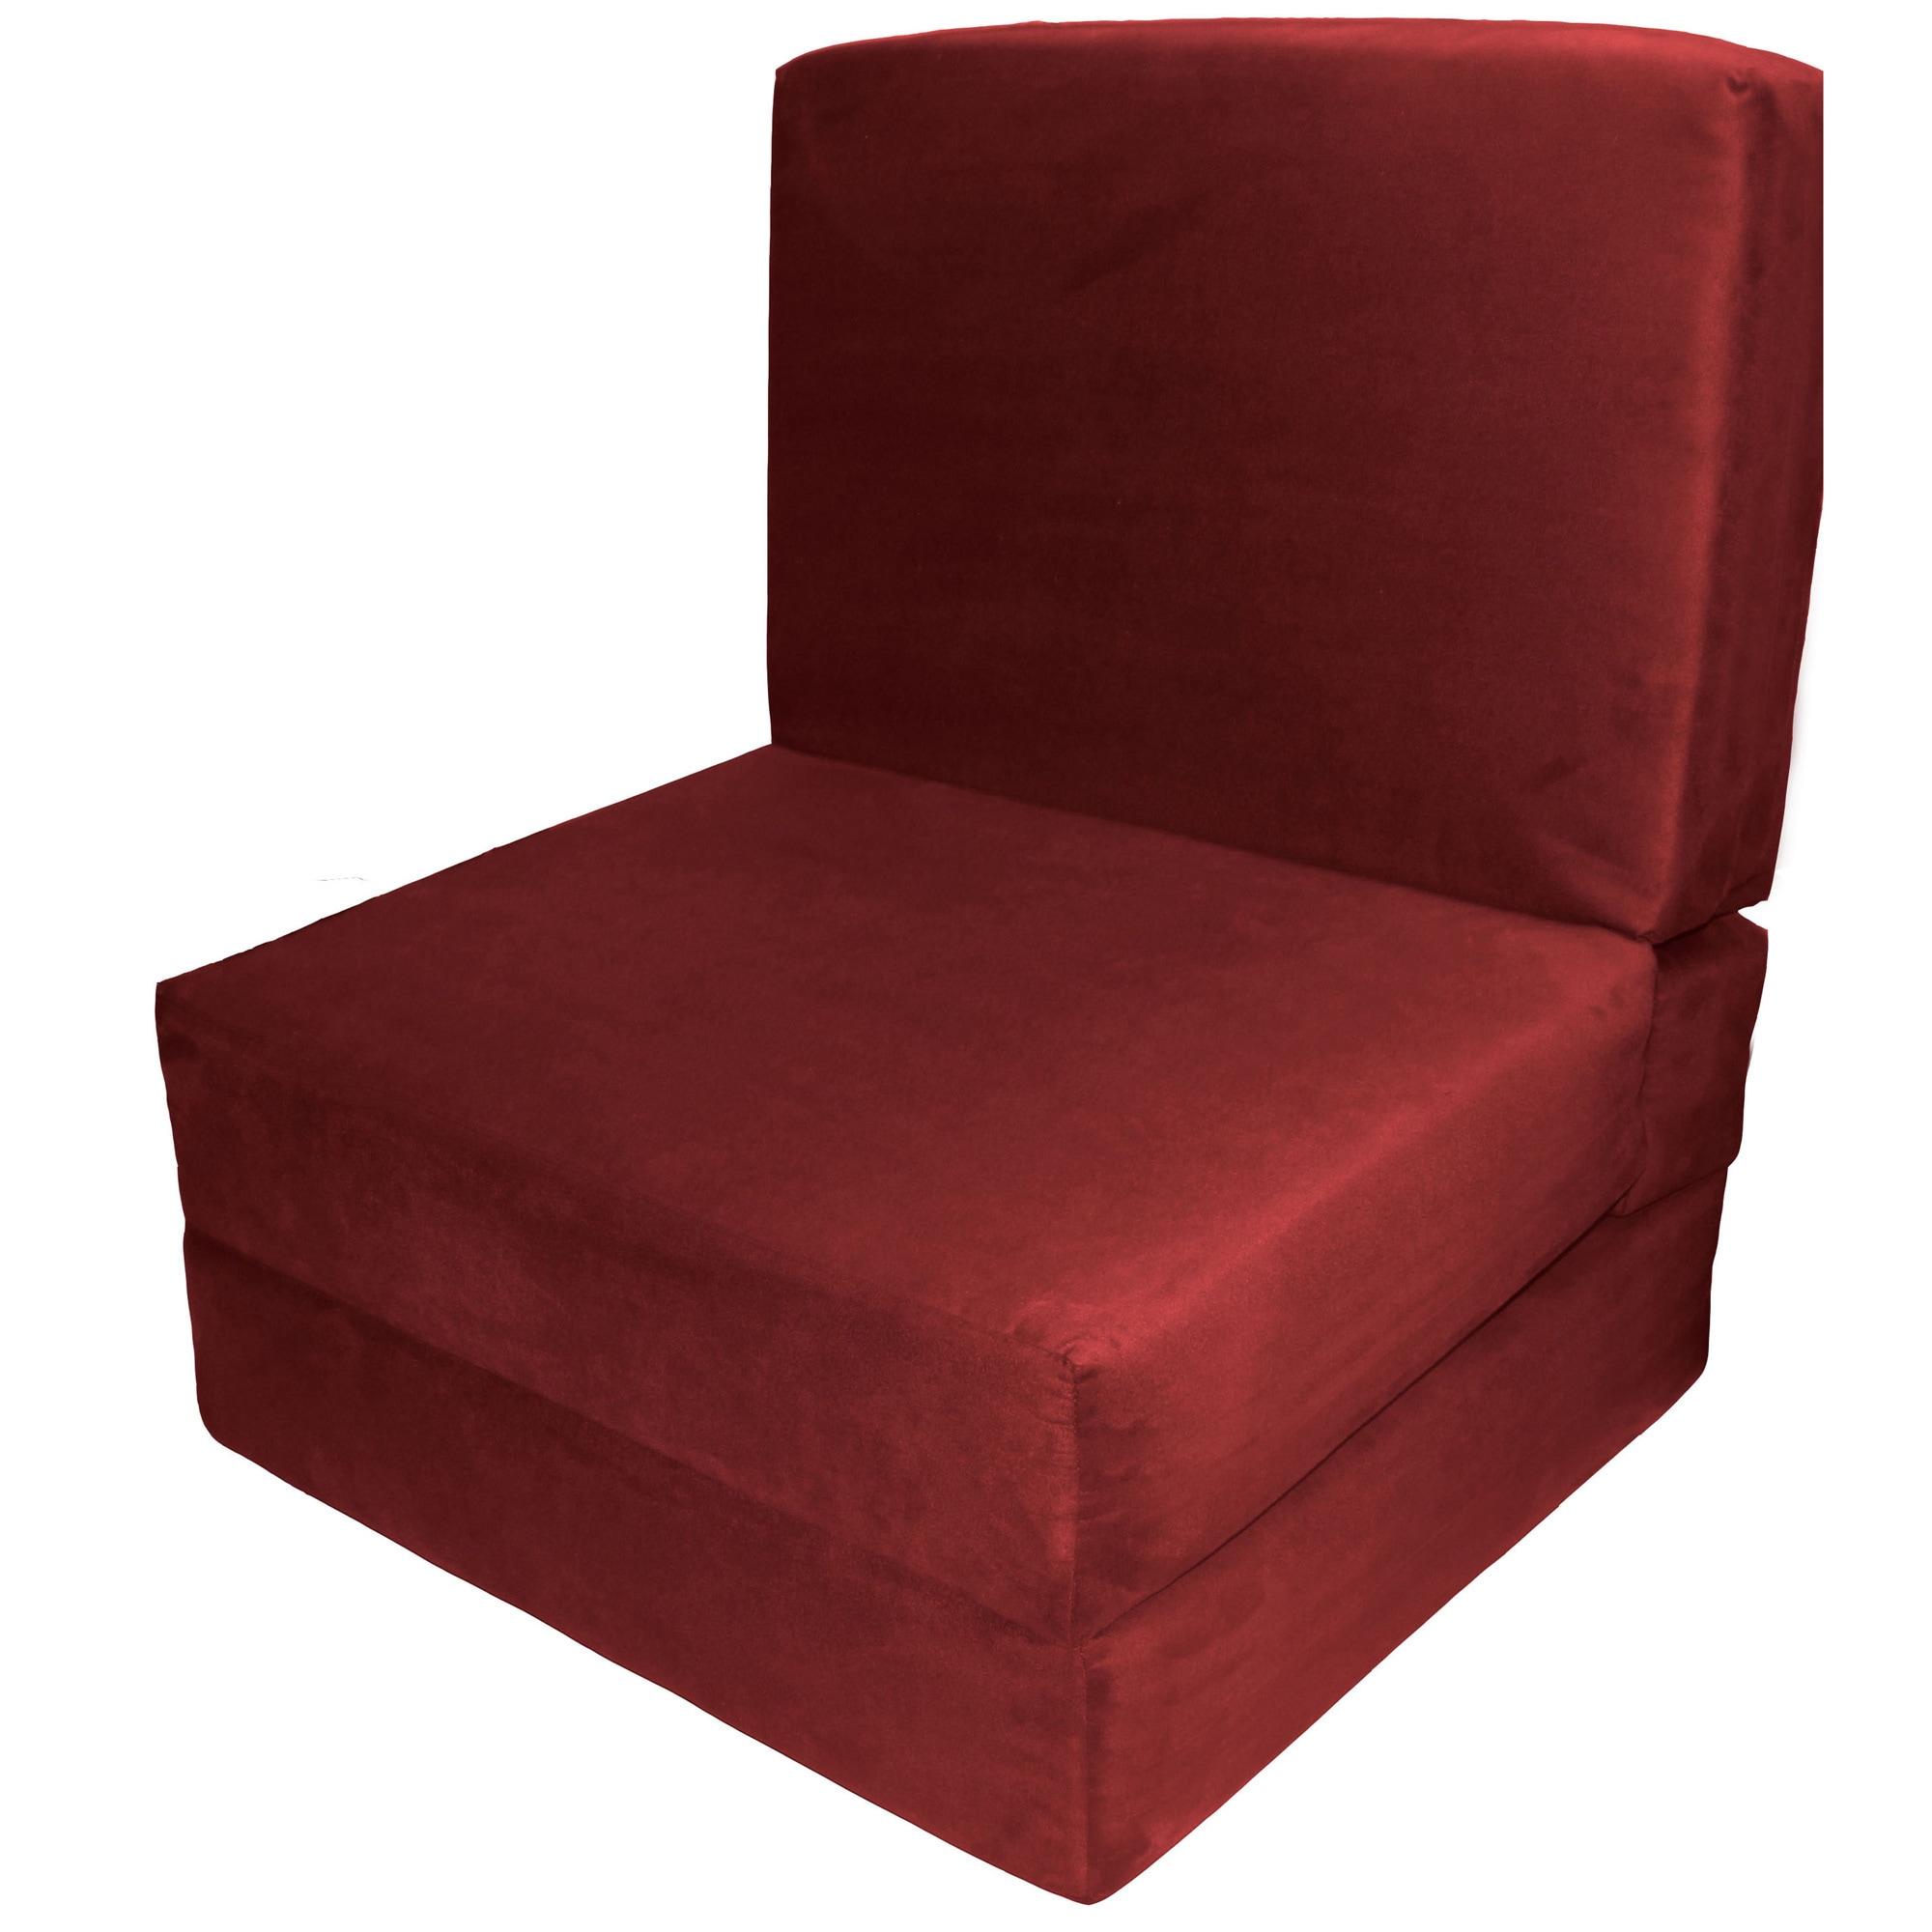 Nomad Adult Microfiber Suede Foam Sleeper Chair Bed Free